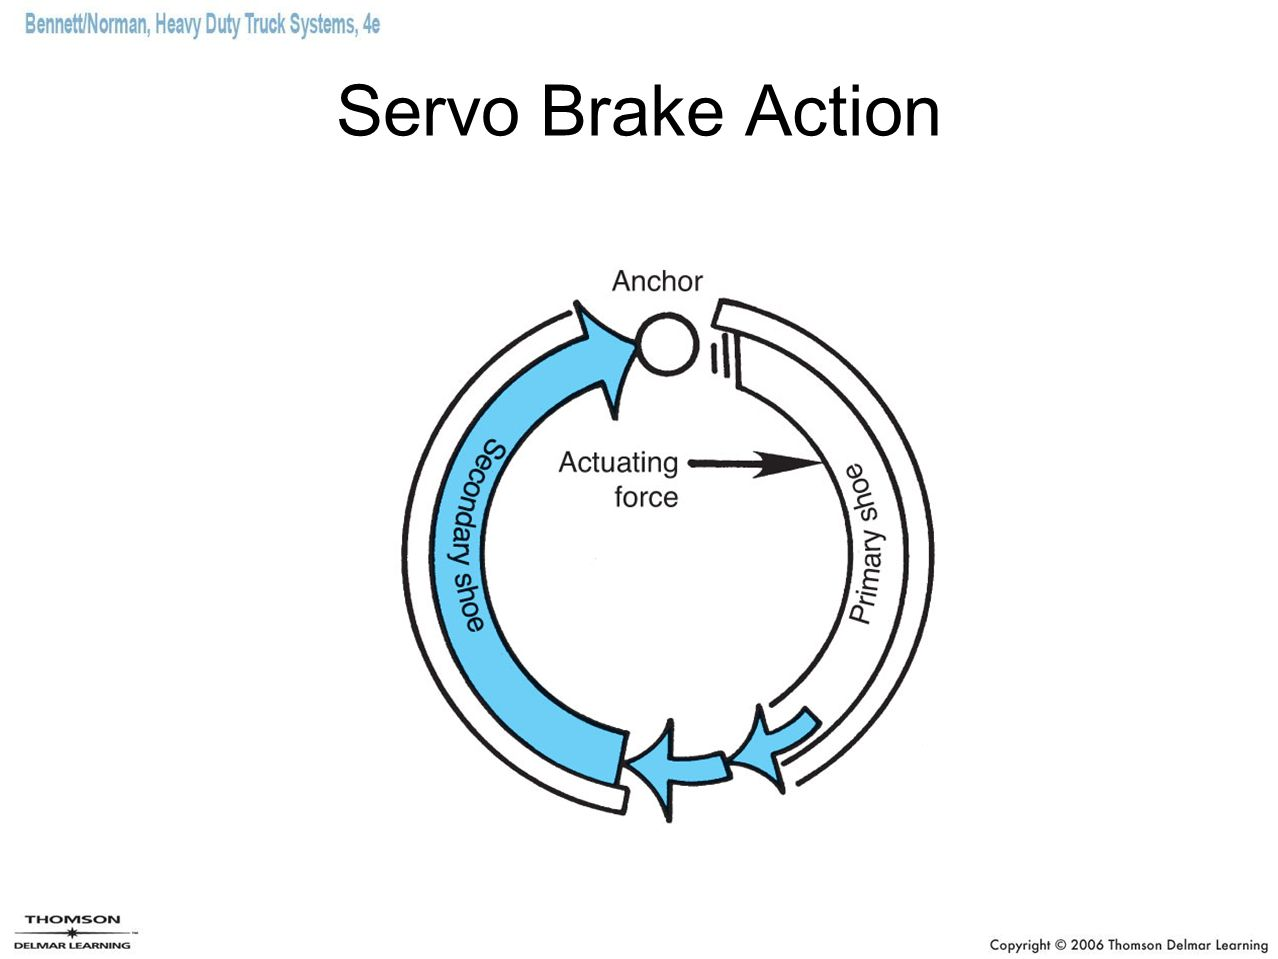 Servo Brake Action